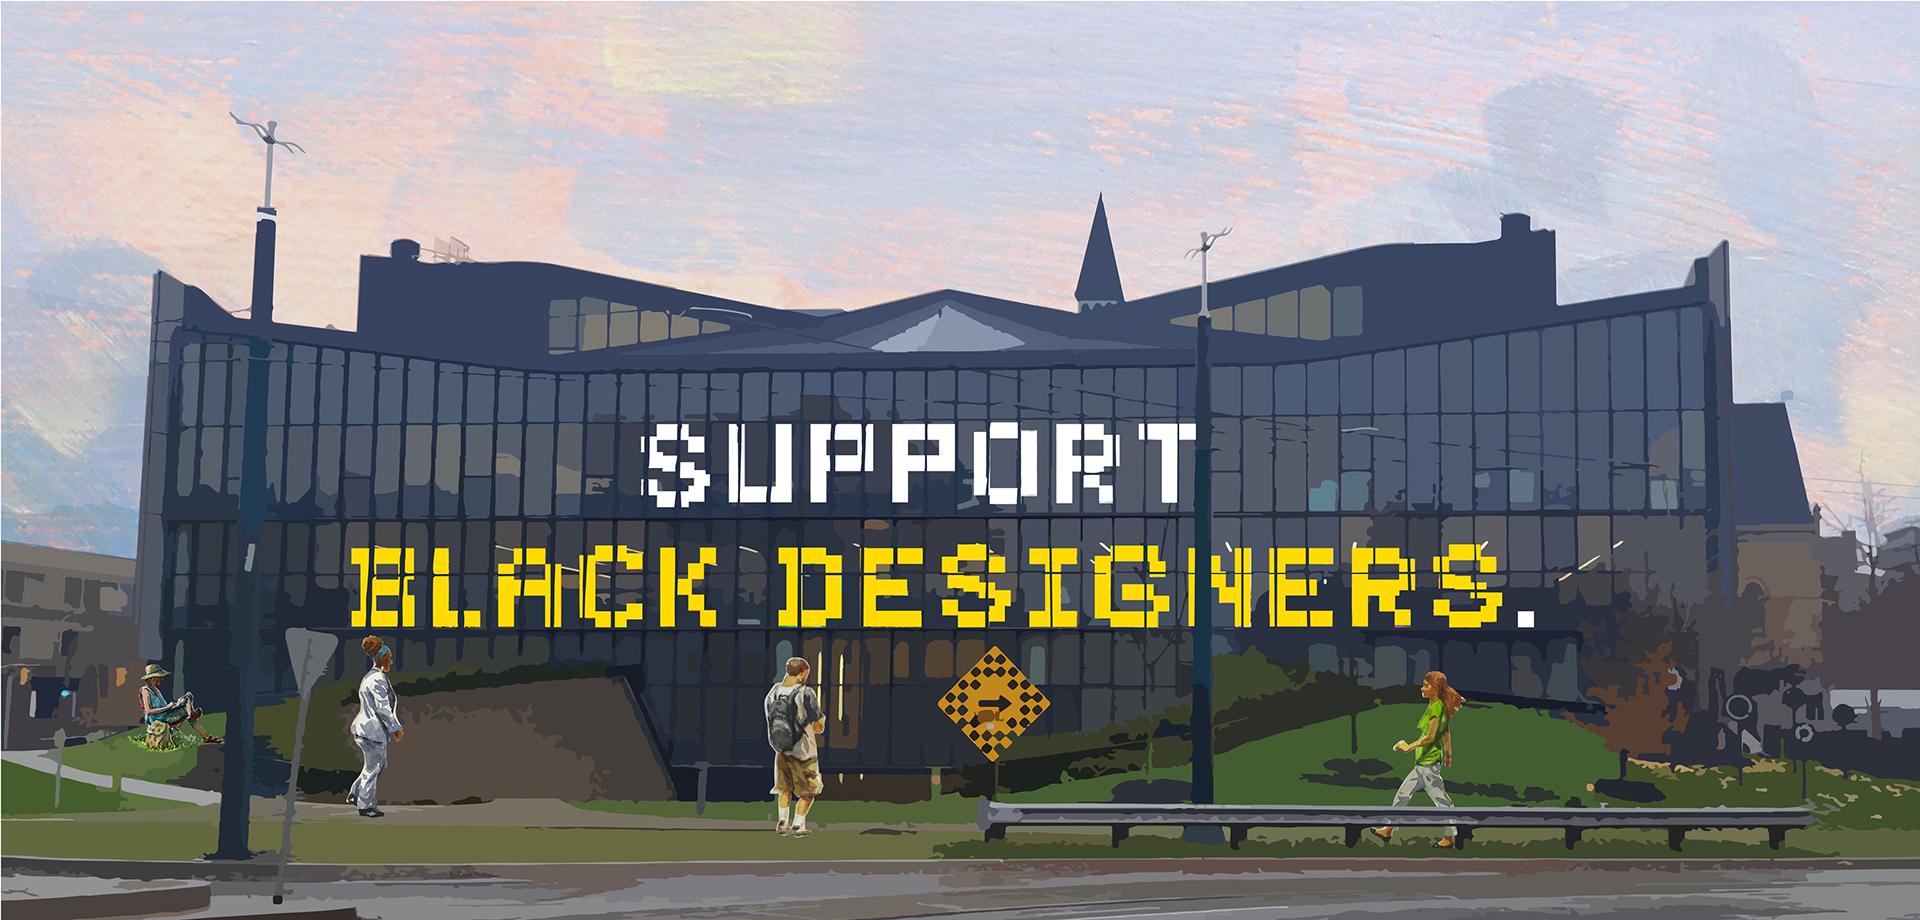 Support Black Designers.